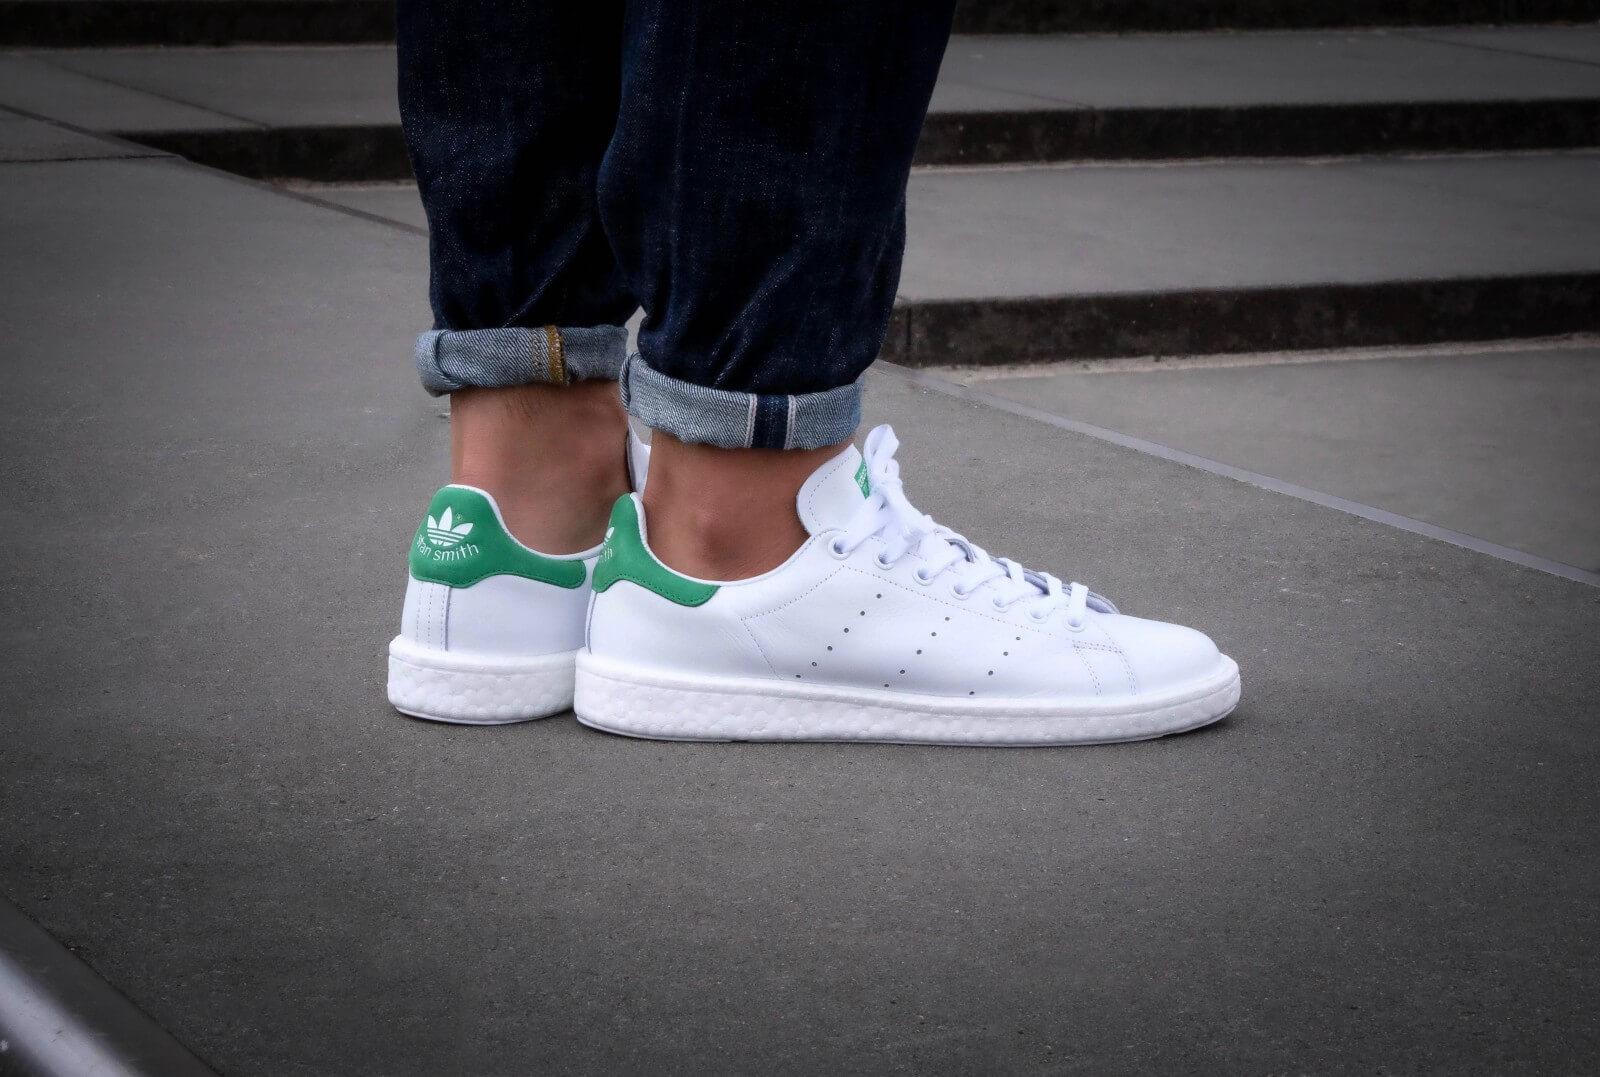 Adidas Stan Smith Boost Footwear White